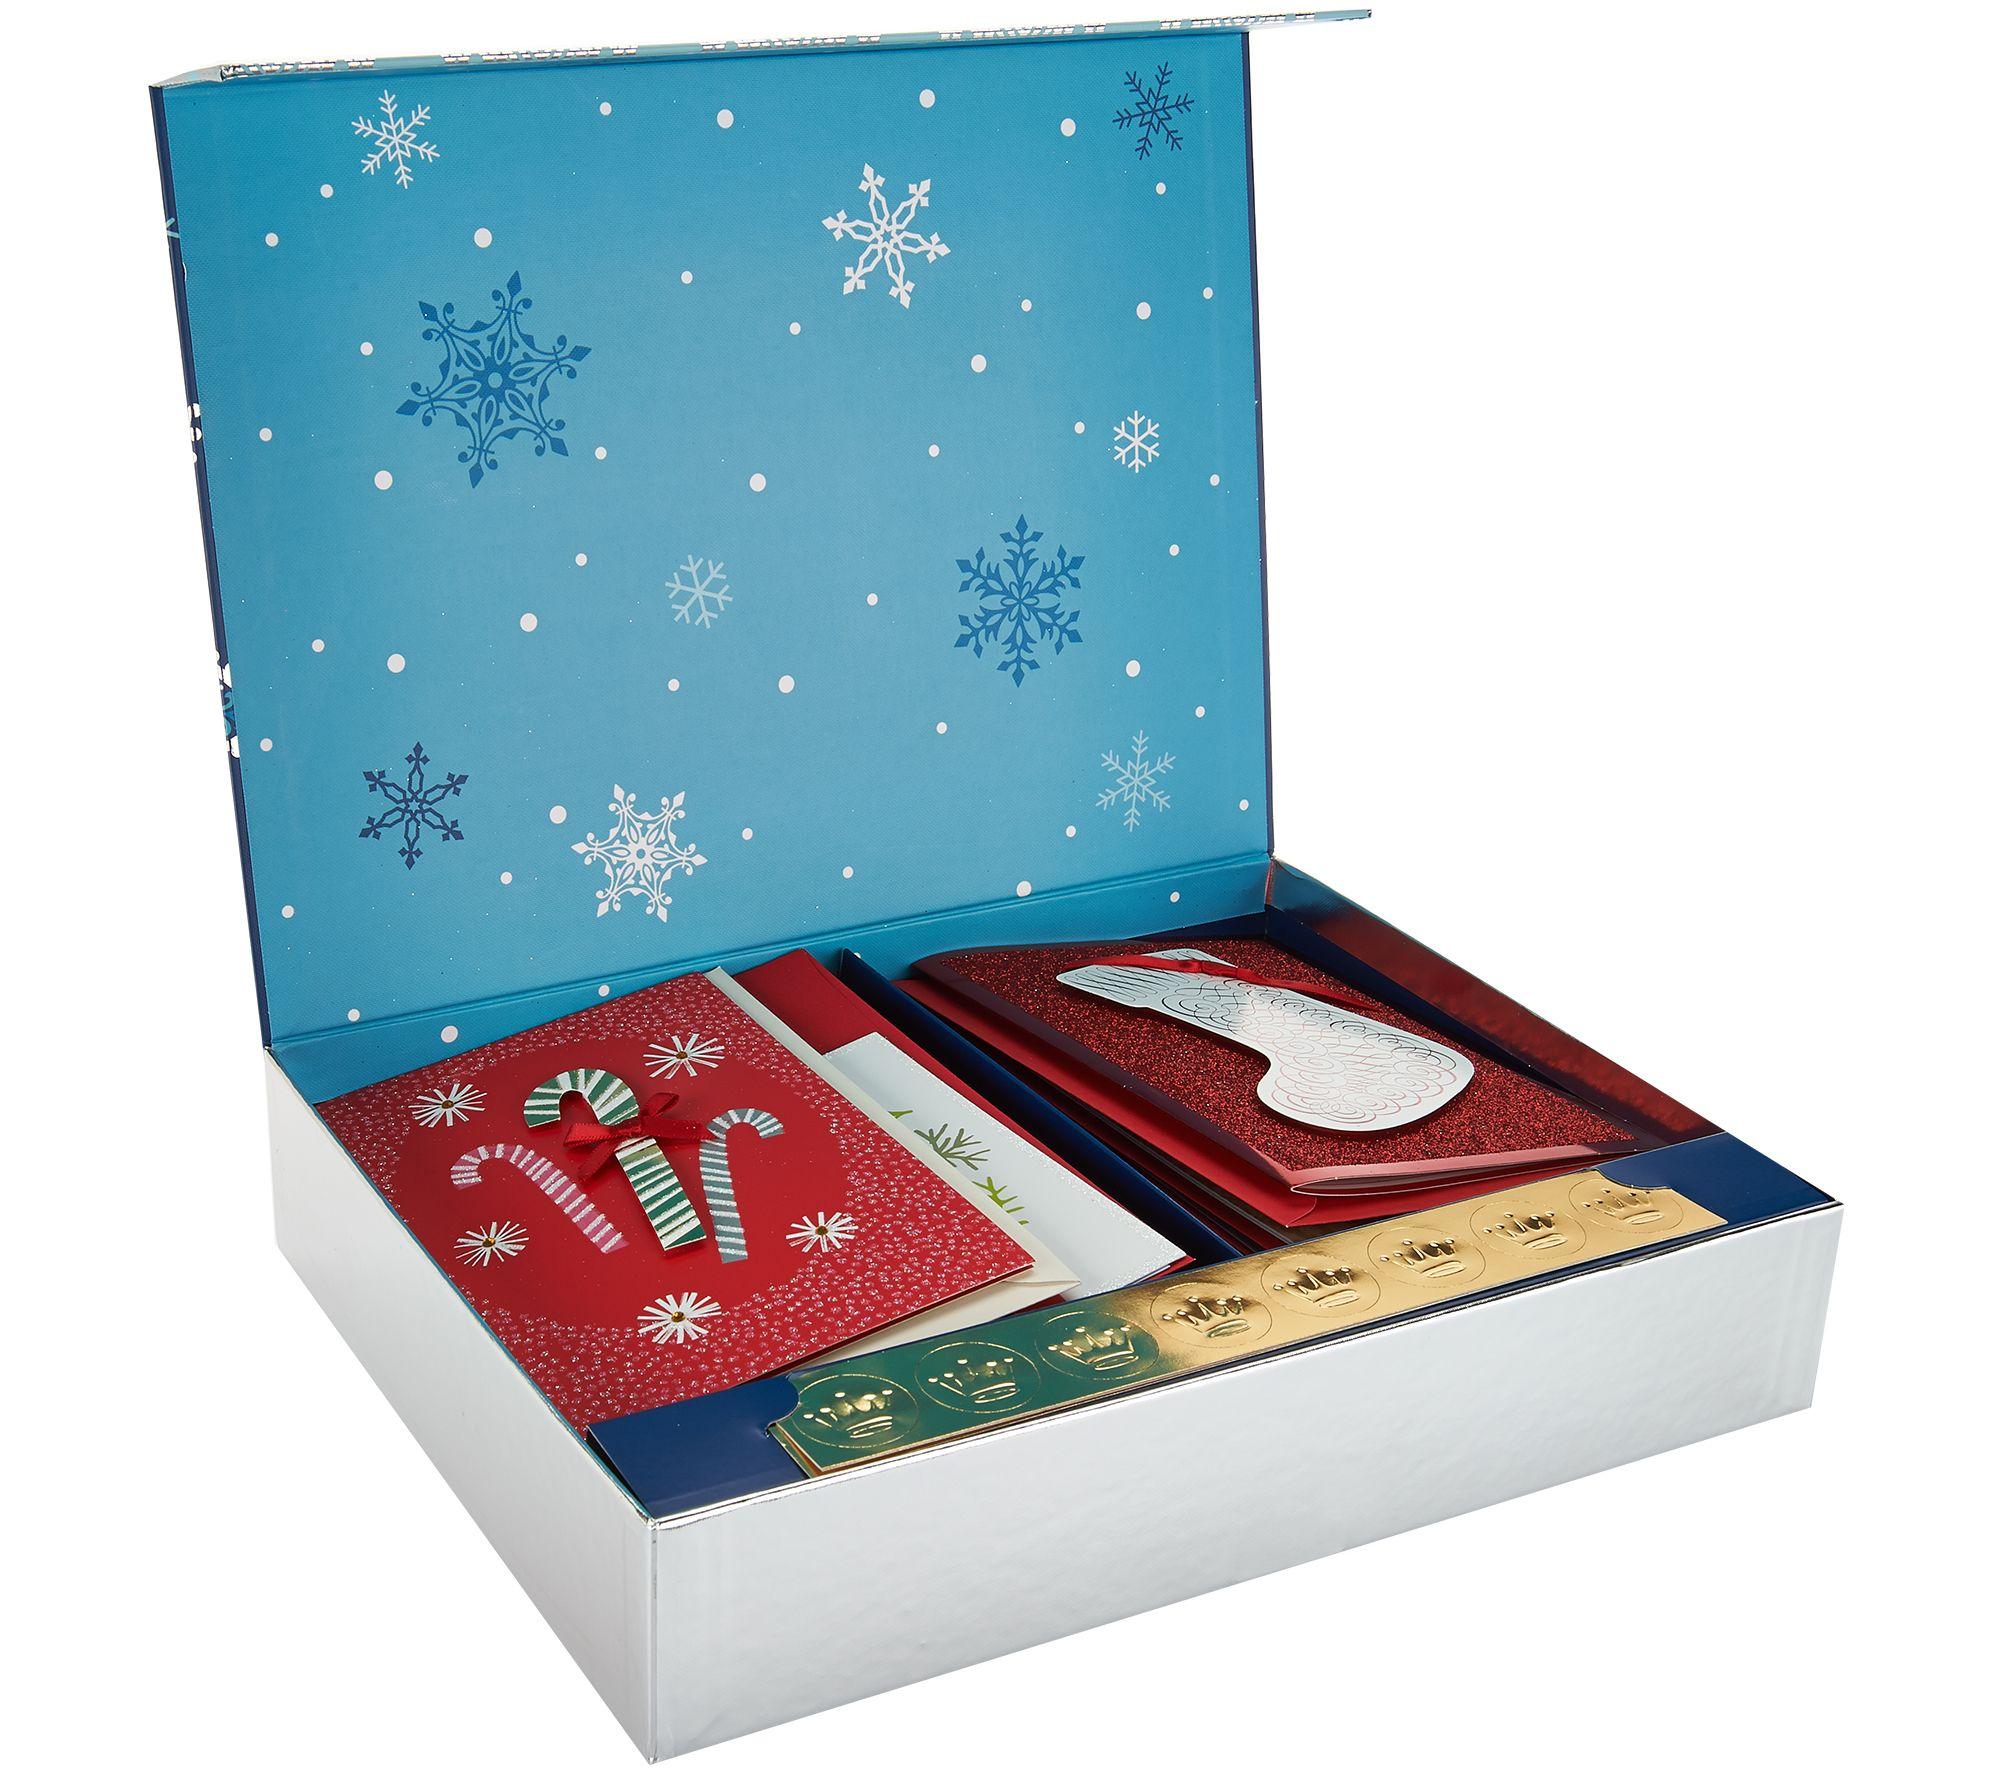 Hallmark 24ct Handcrafted Embellished Boxed Card Set W Storage Box